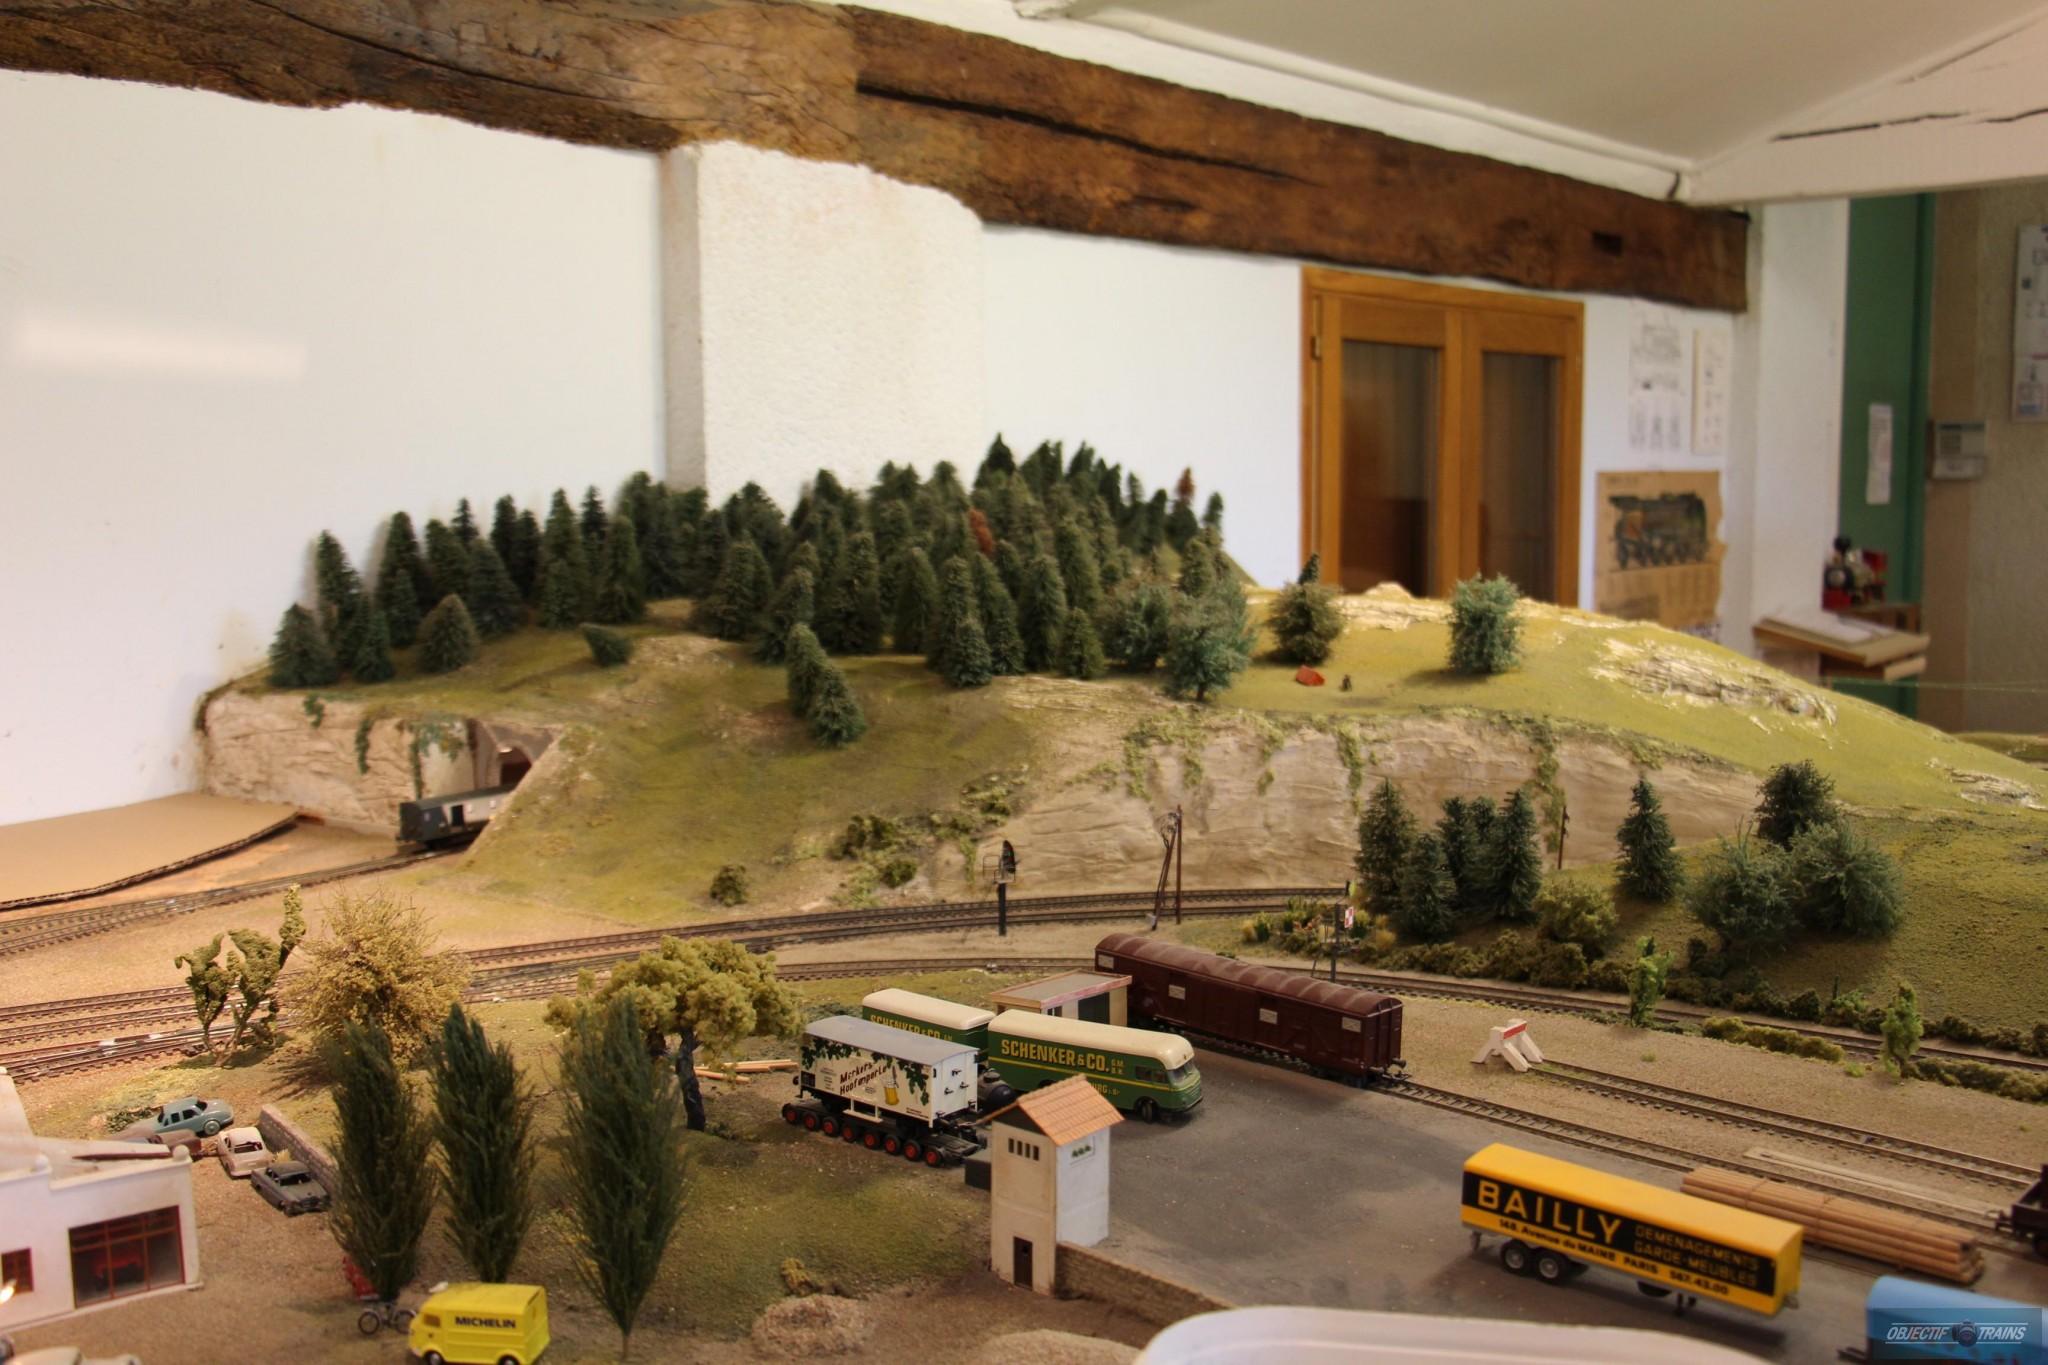 reseau-rail miniature castrais-castres-reseau-Ho (26)